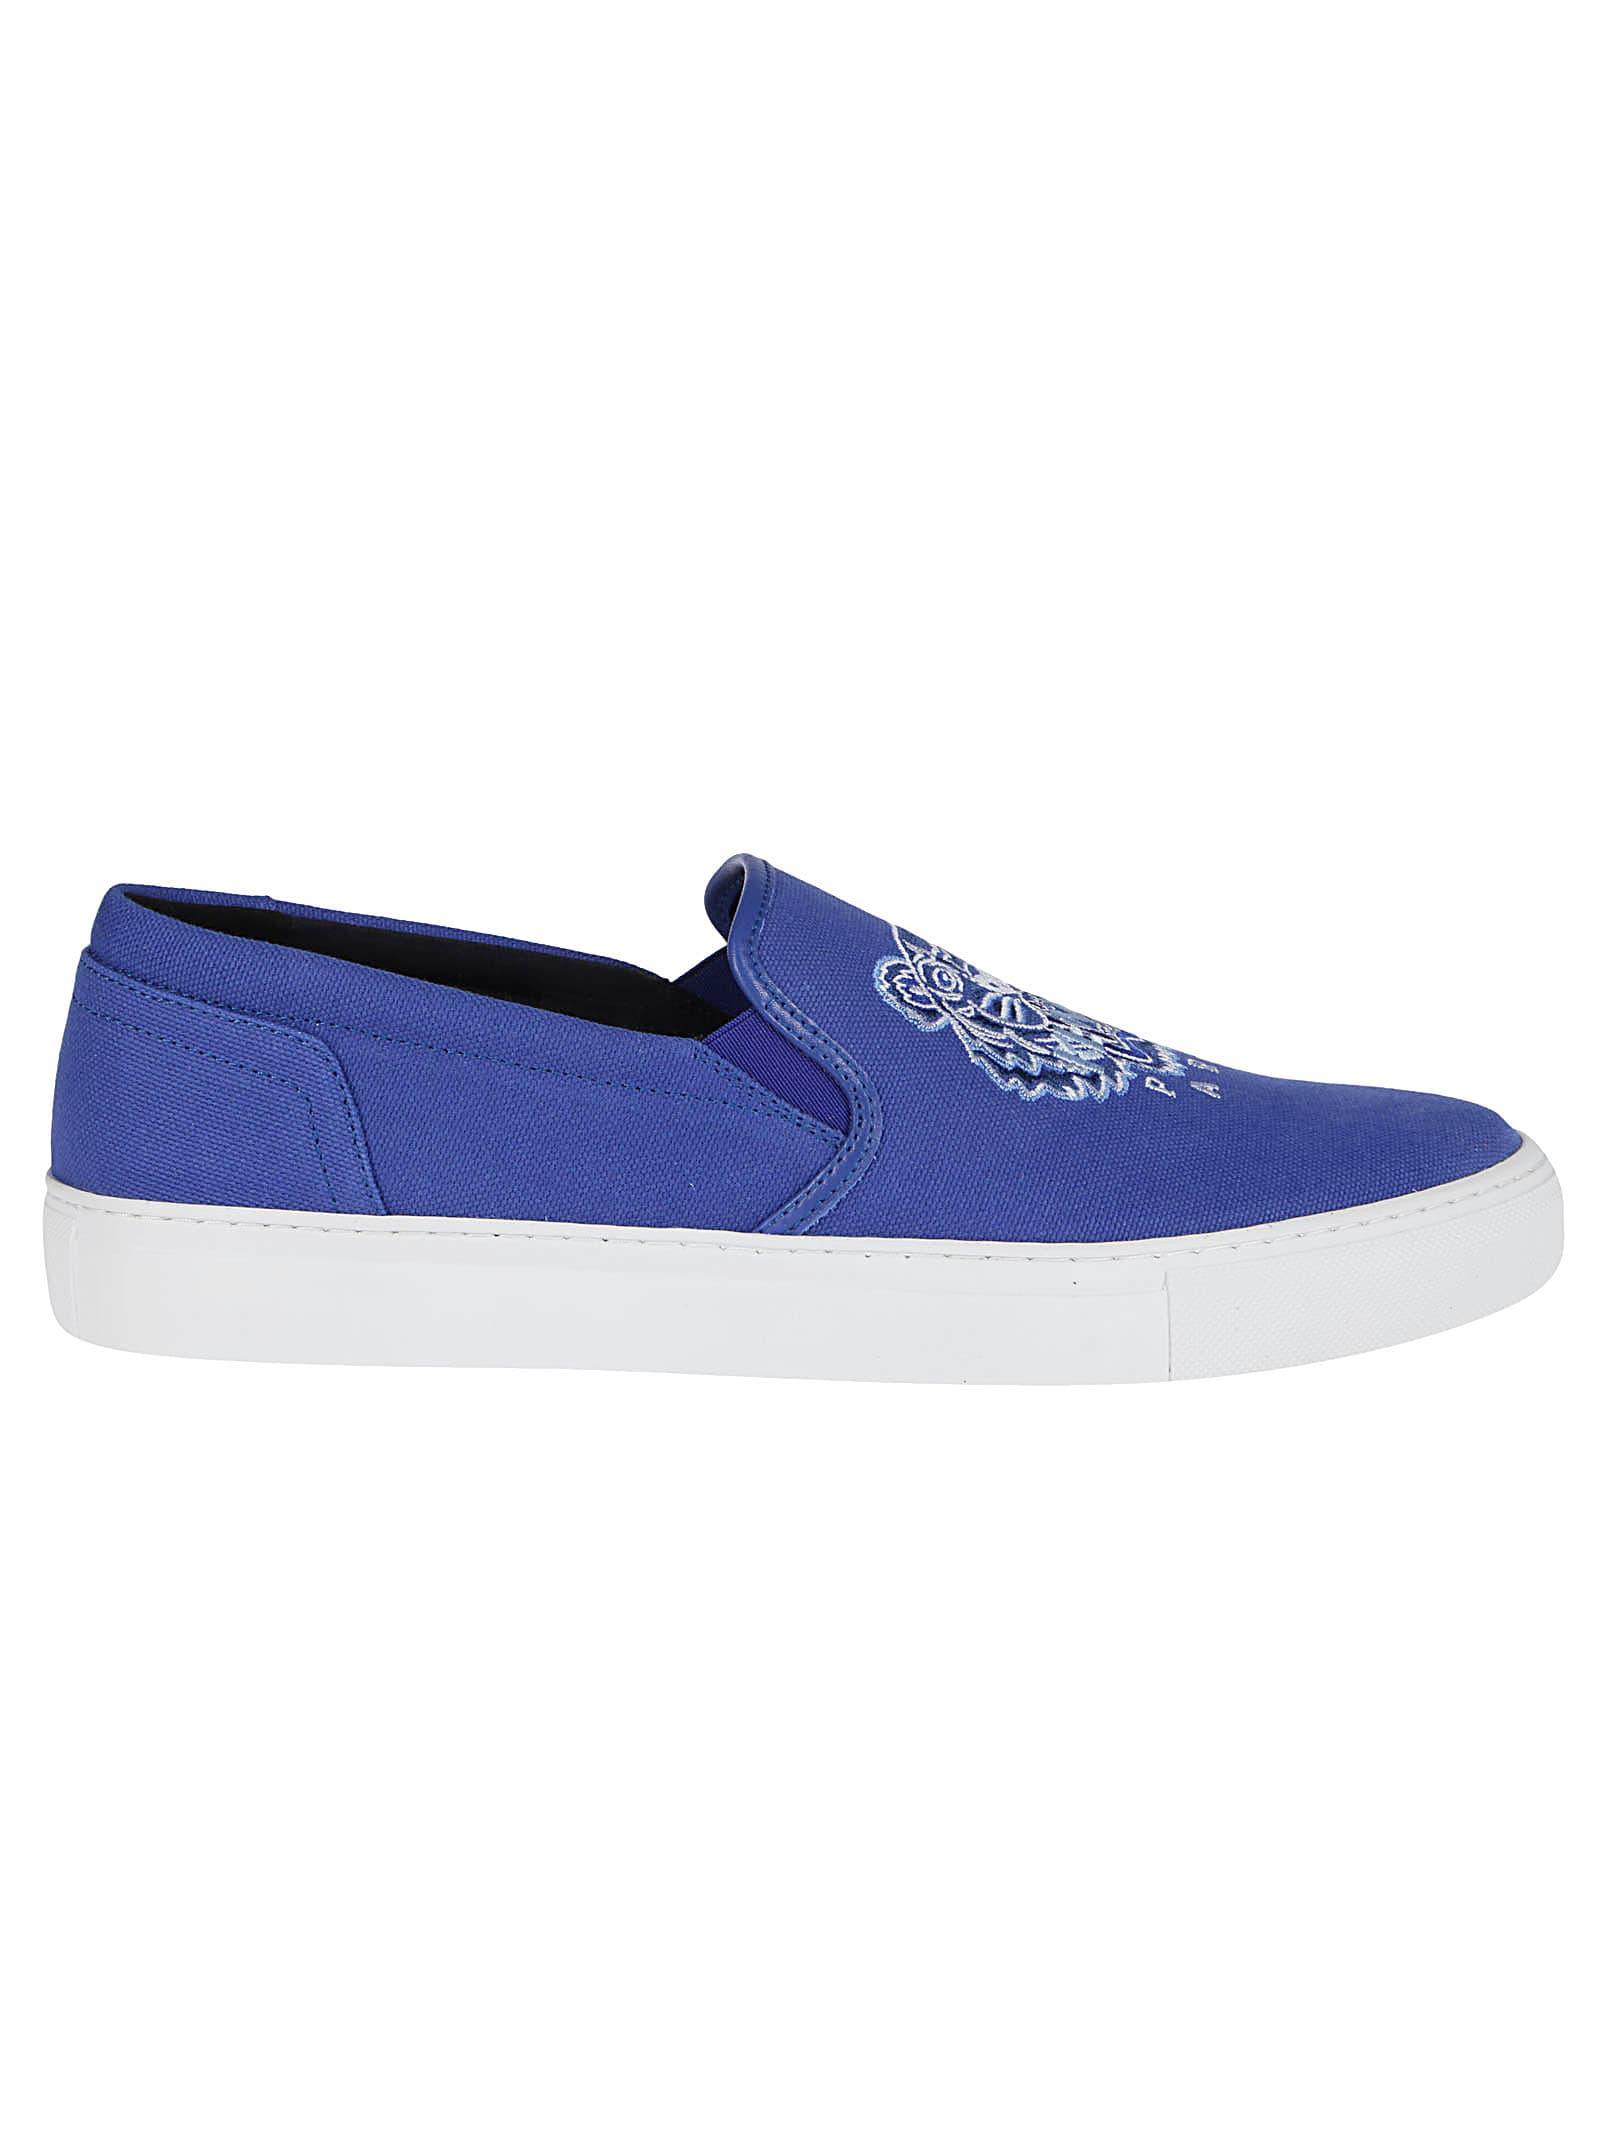 Kenzo Activewears BLUE COTTON ESPADRILLAS